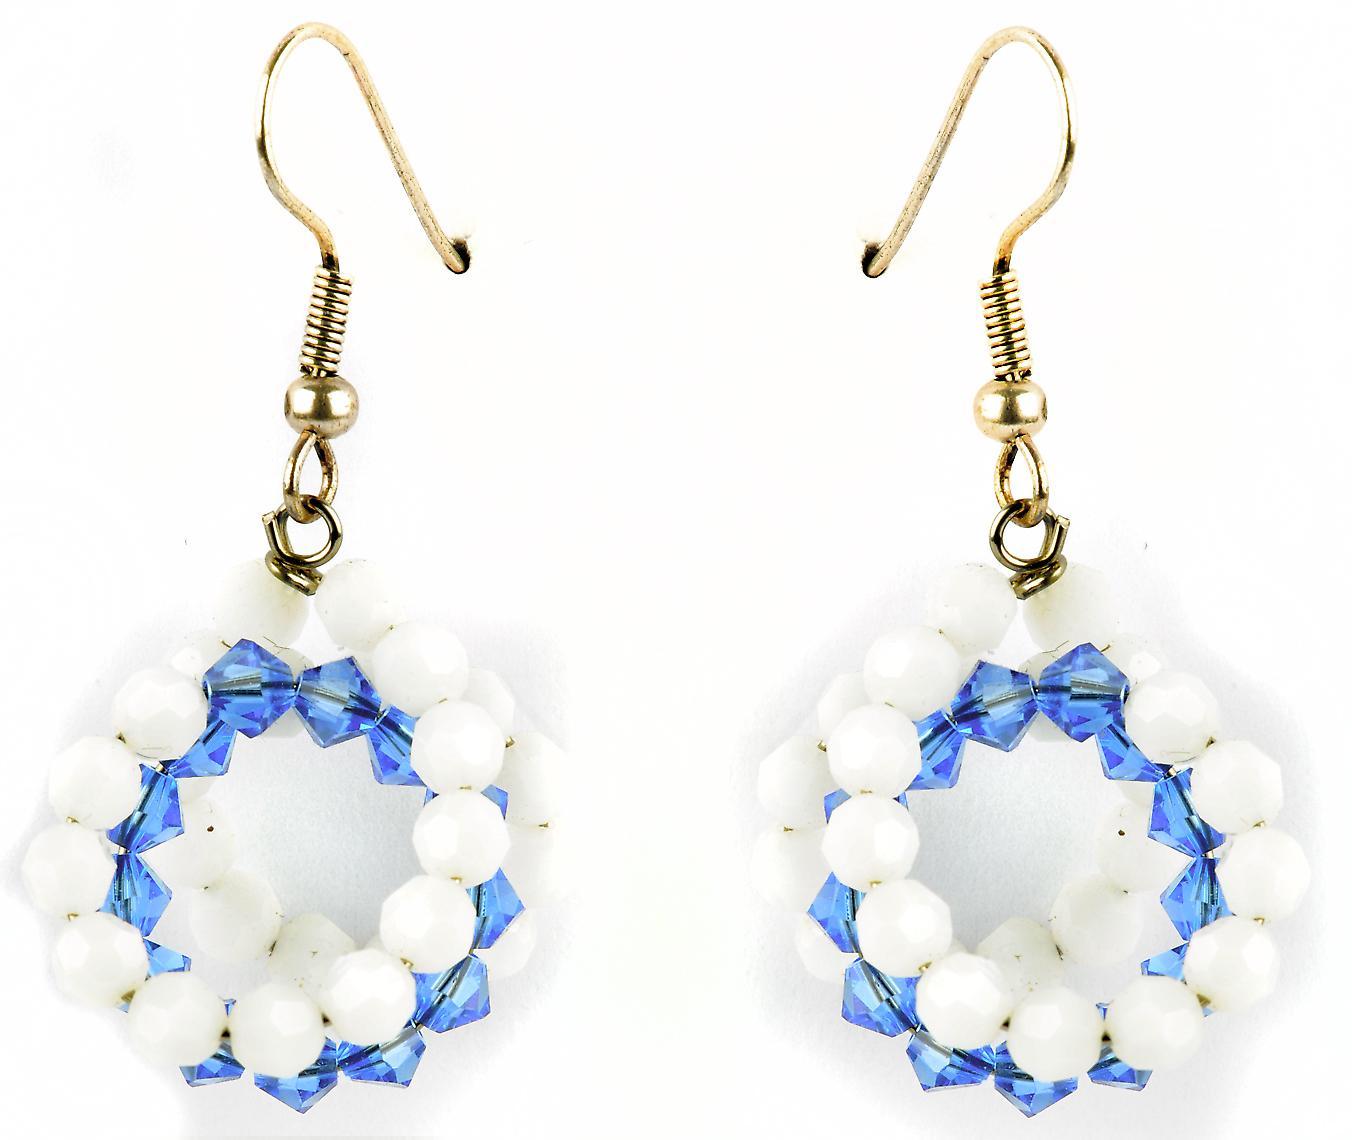 Waooh - jewelry - WJ0750 - earrings with Rhinestone Swarovski white & blue Transparent